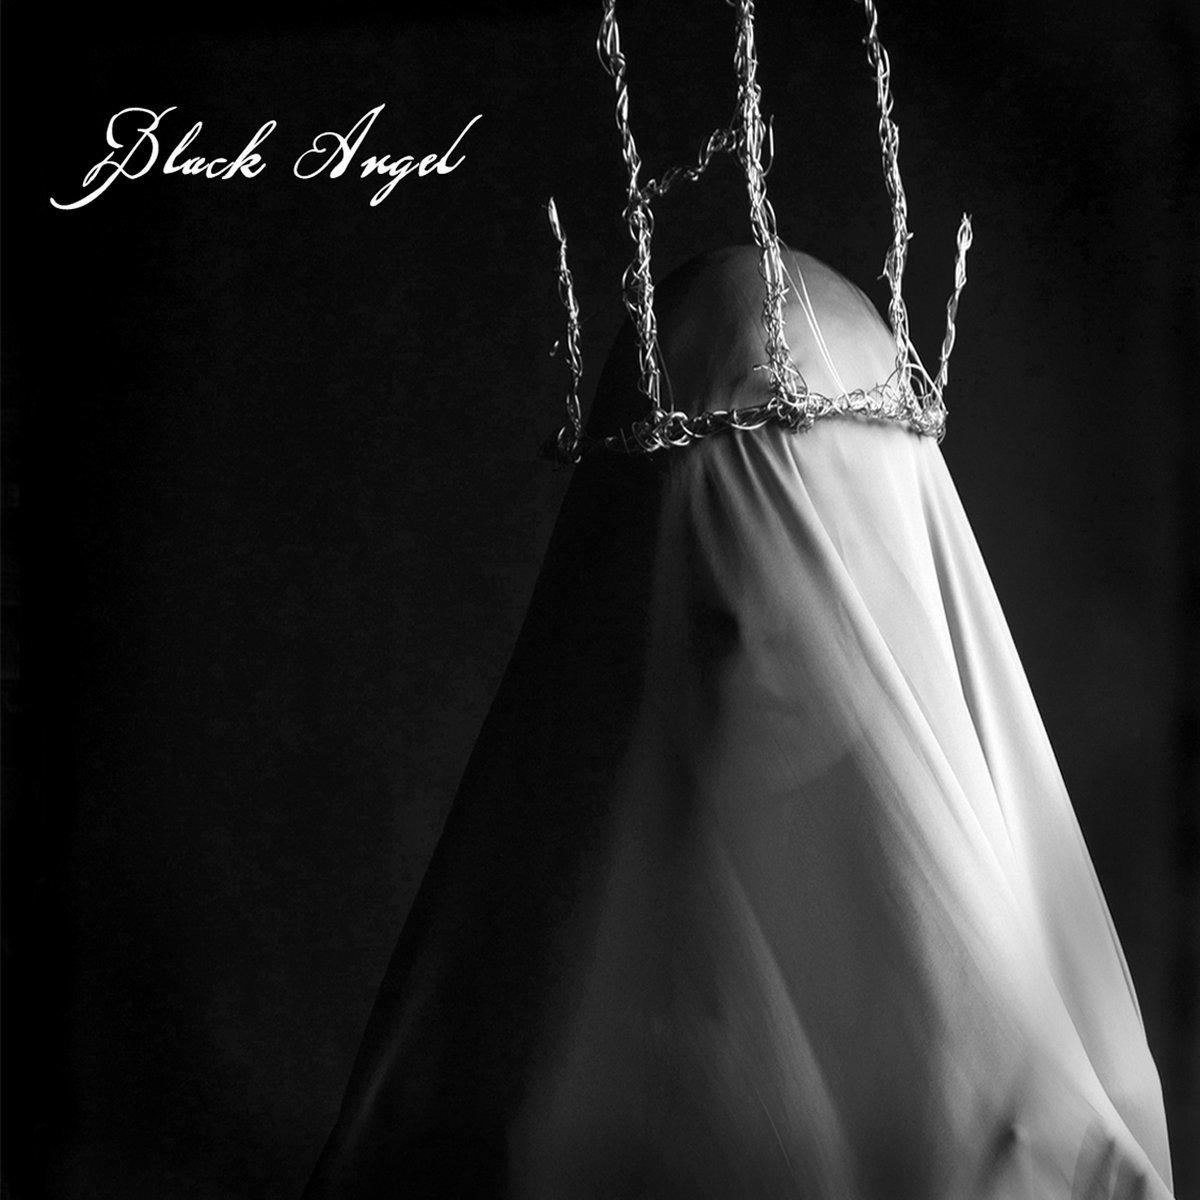 Black Angel, 'Kiss of Death'